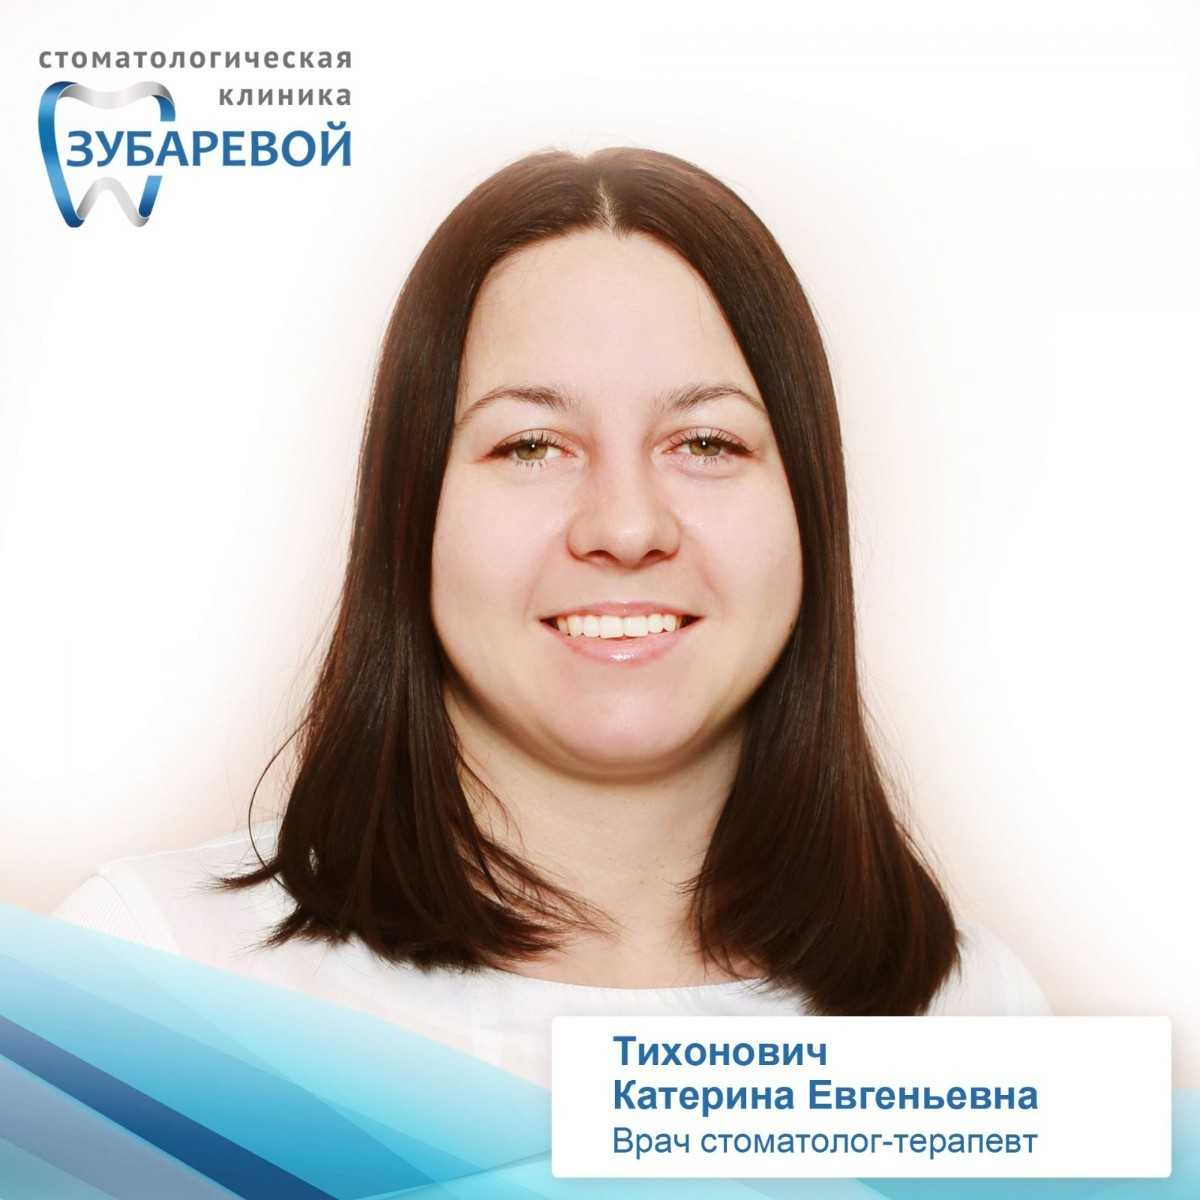 Тихонович Катерина Евгеньевна - фотография